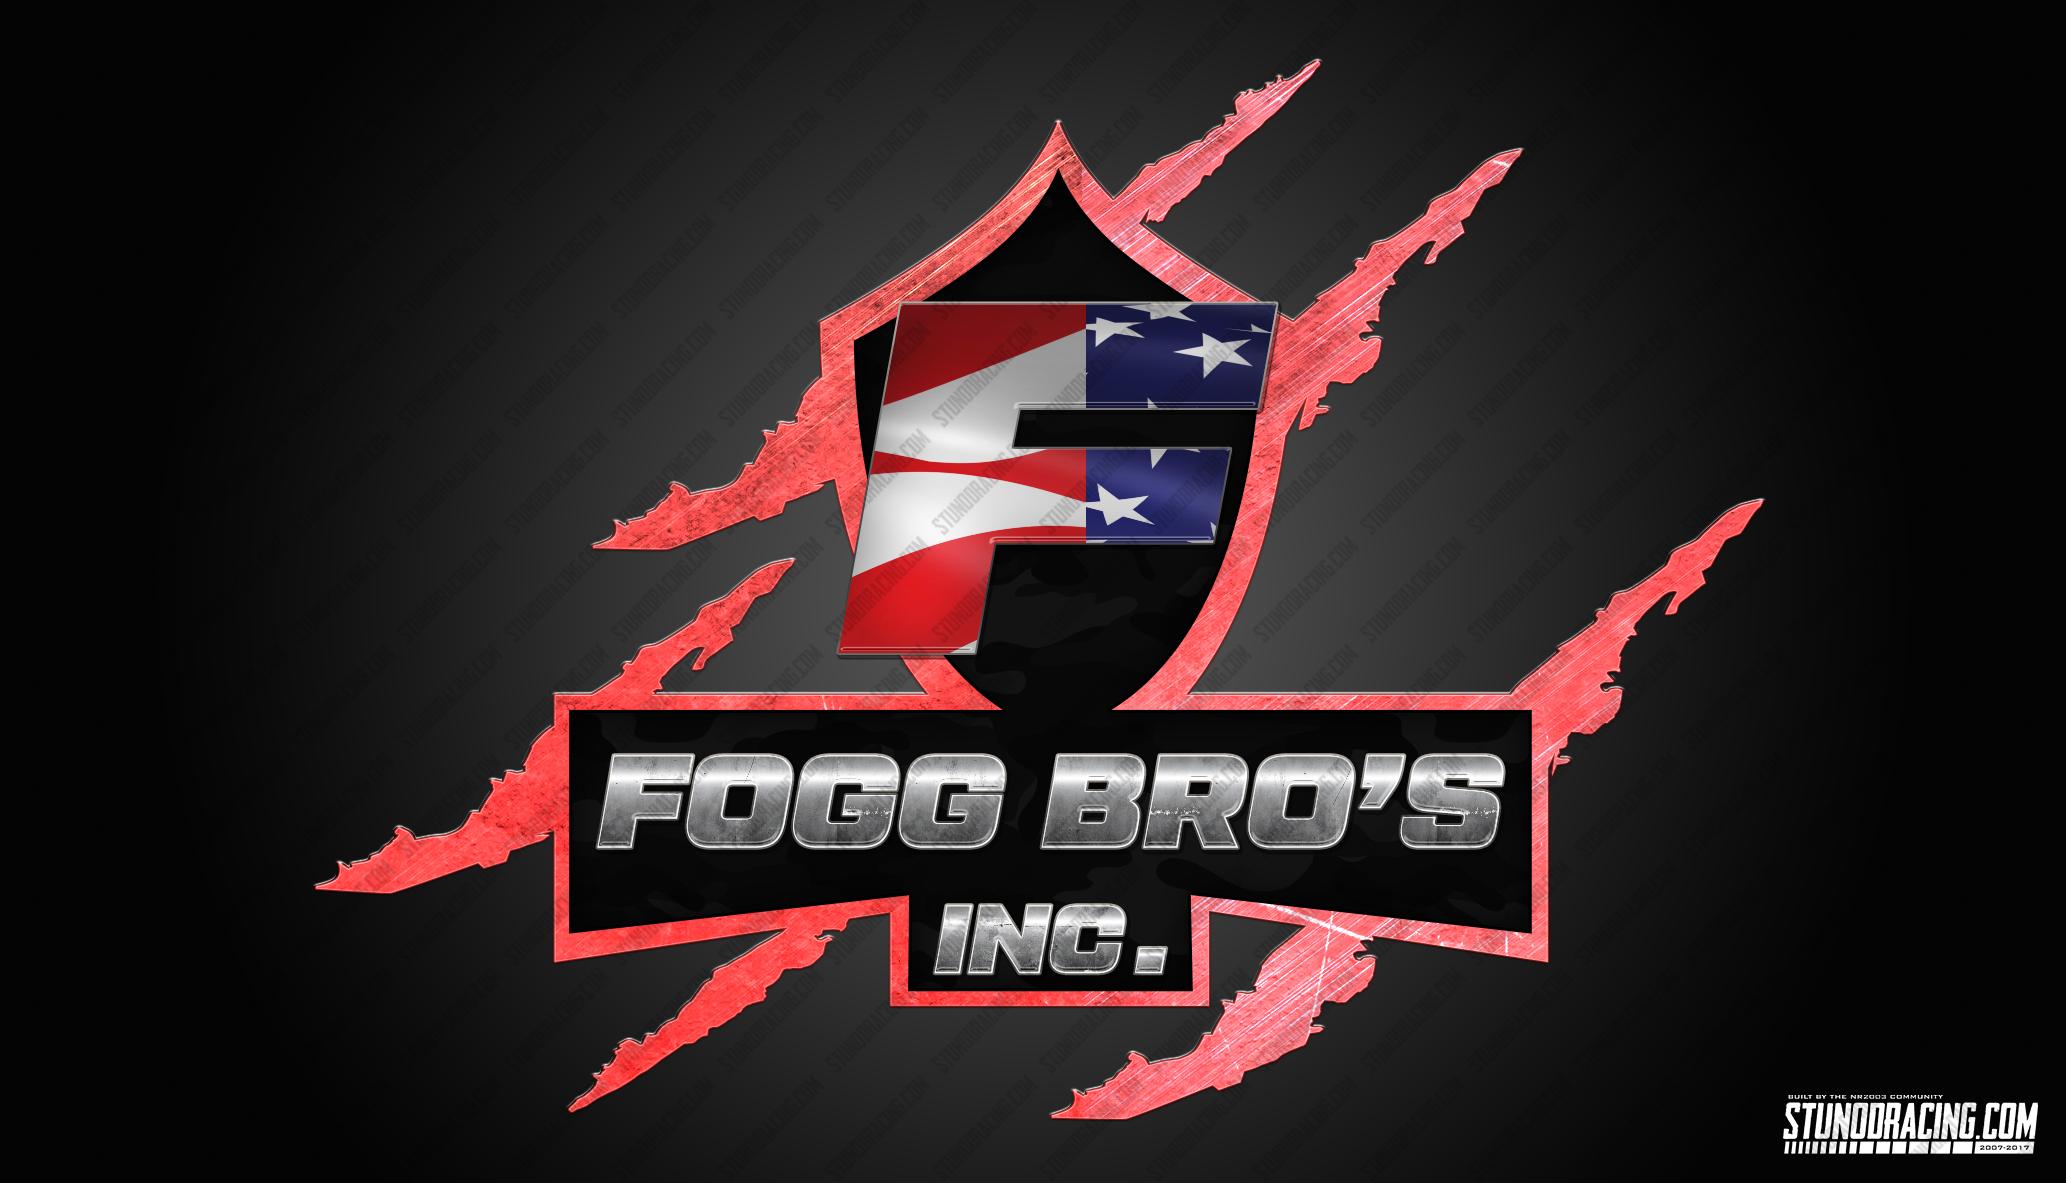 fogg_bros_logo.jpg